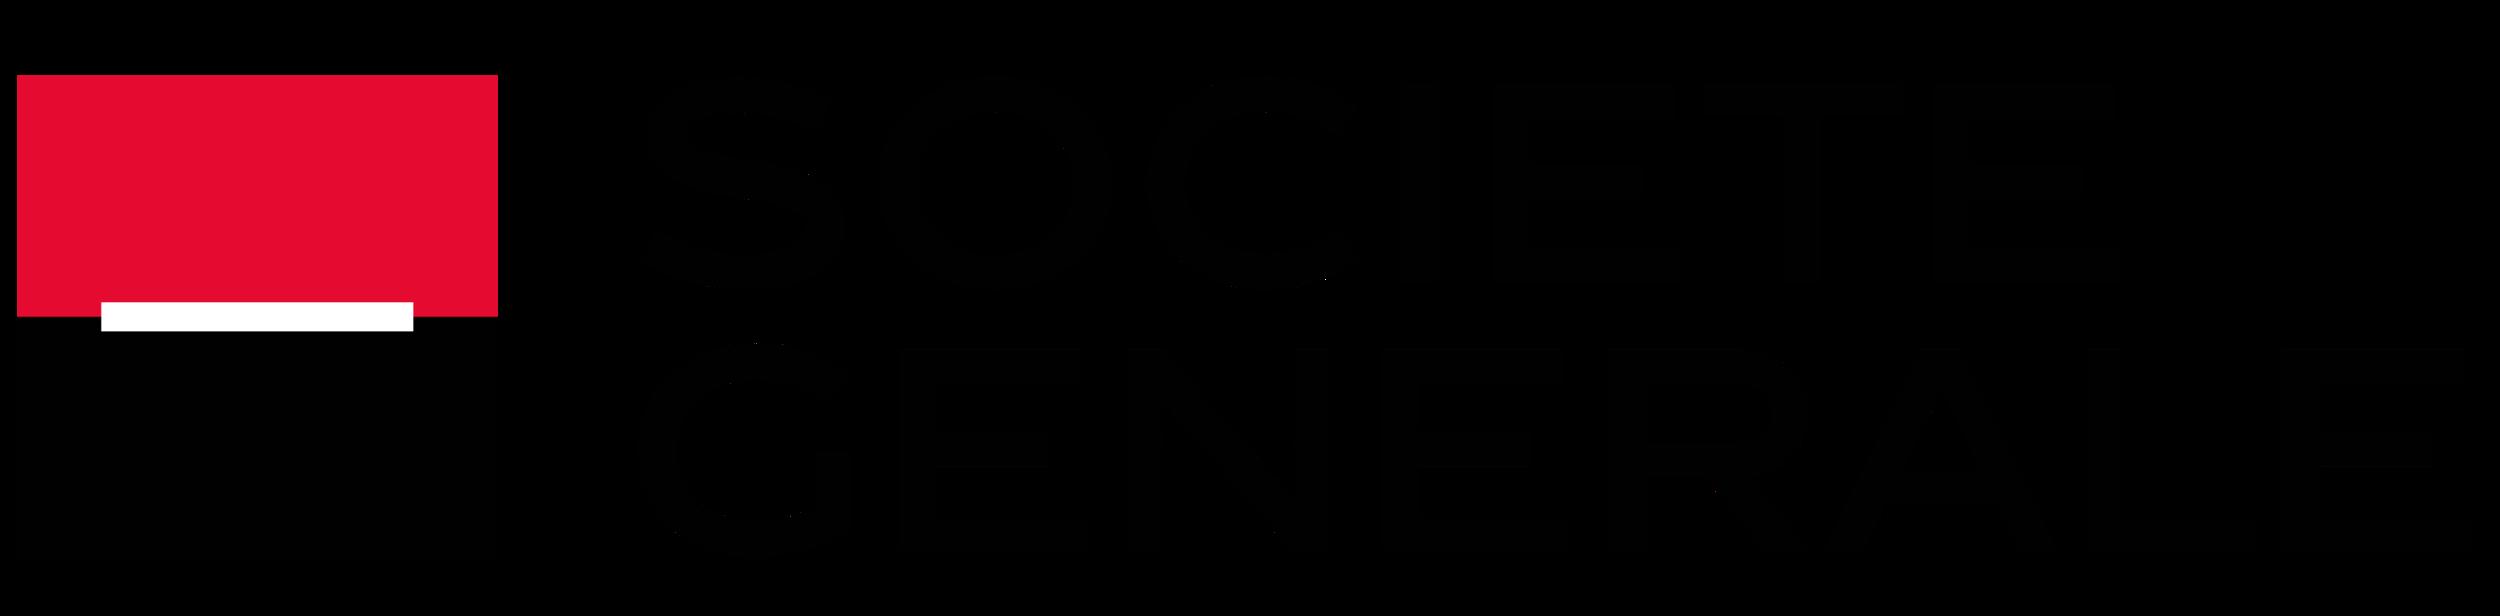 Societe_Generale_logo.png